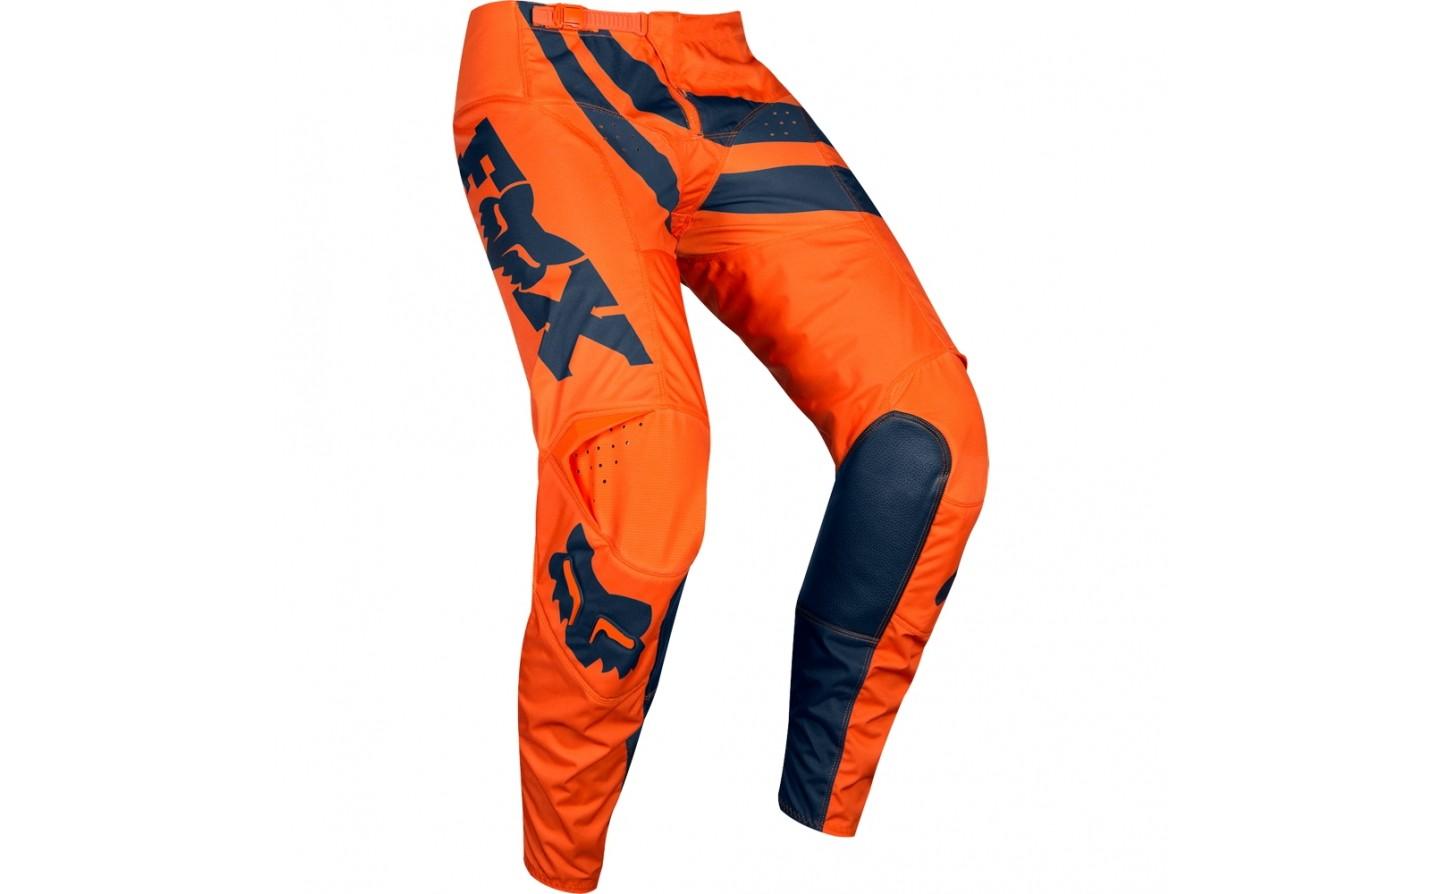 5c369b3b12071 ... Pantalón Motocross Fox Yth 180 Cota Pant Infantil Naranja